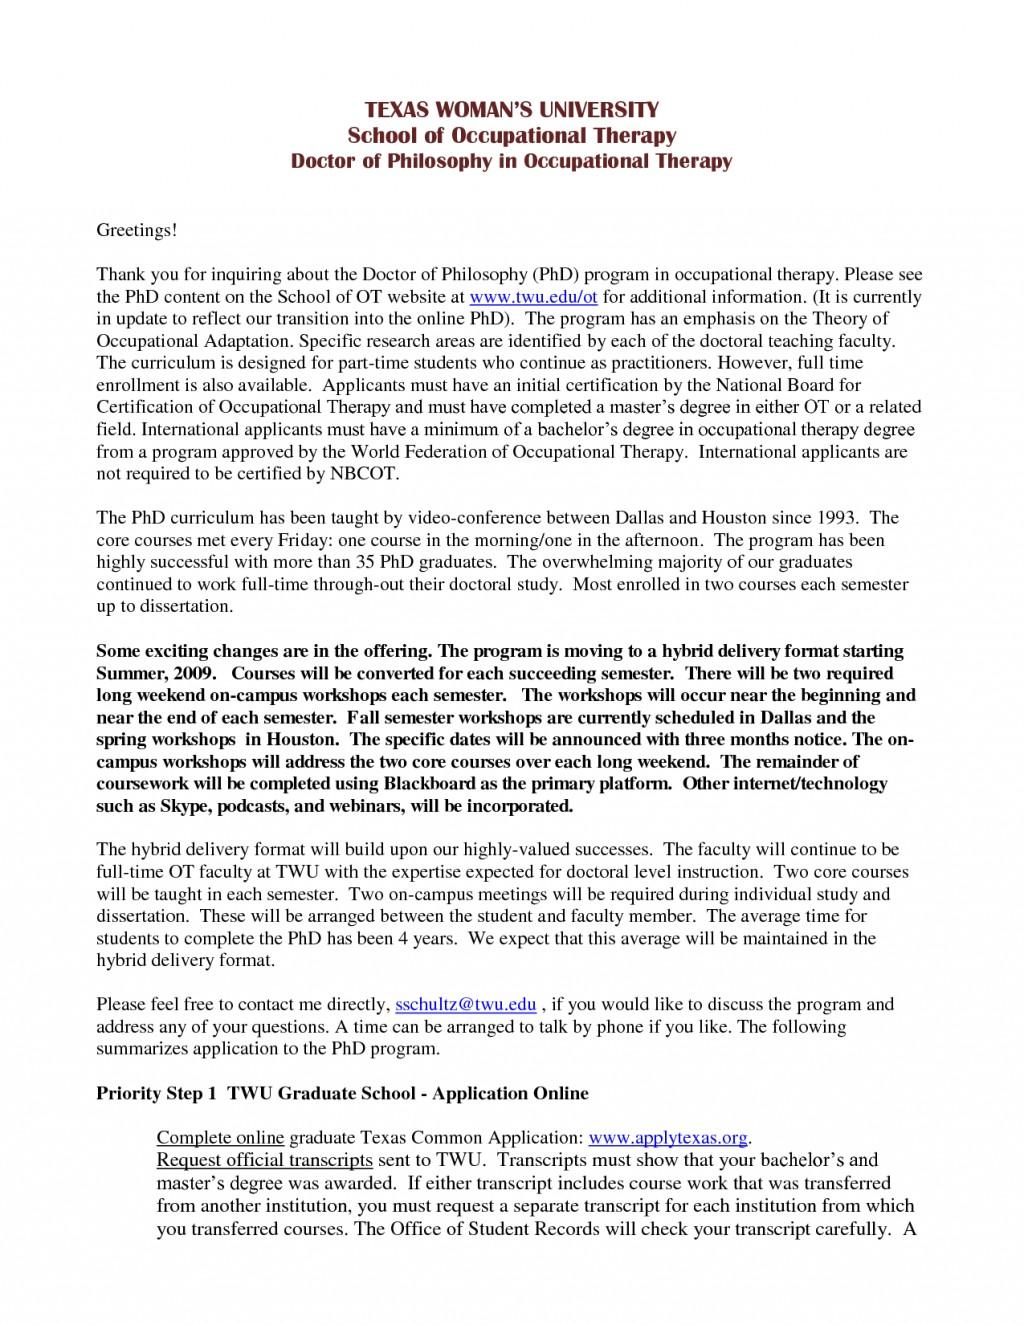 007 Apply Texas Essays Fall P2nuwjbgnb Essay Impressive 2015 Large